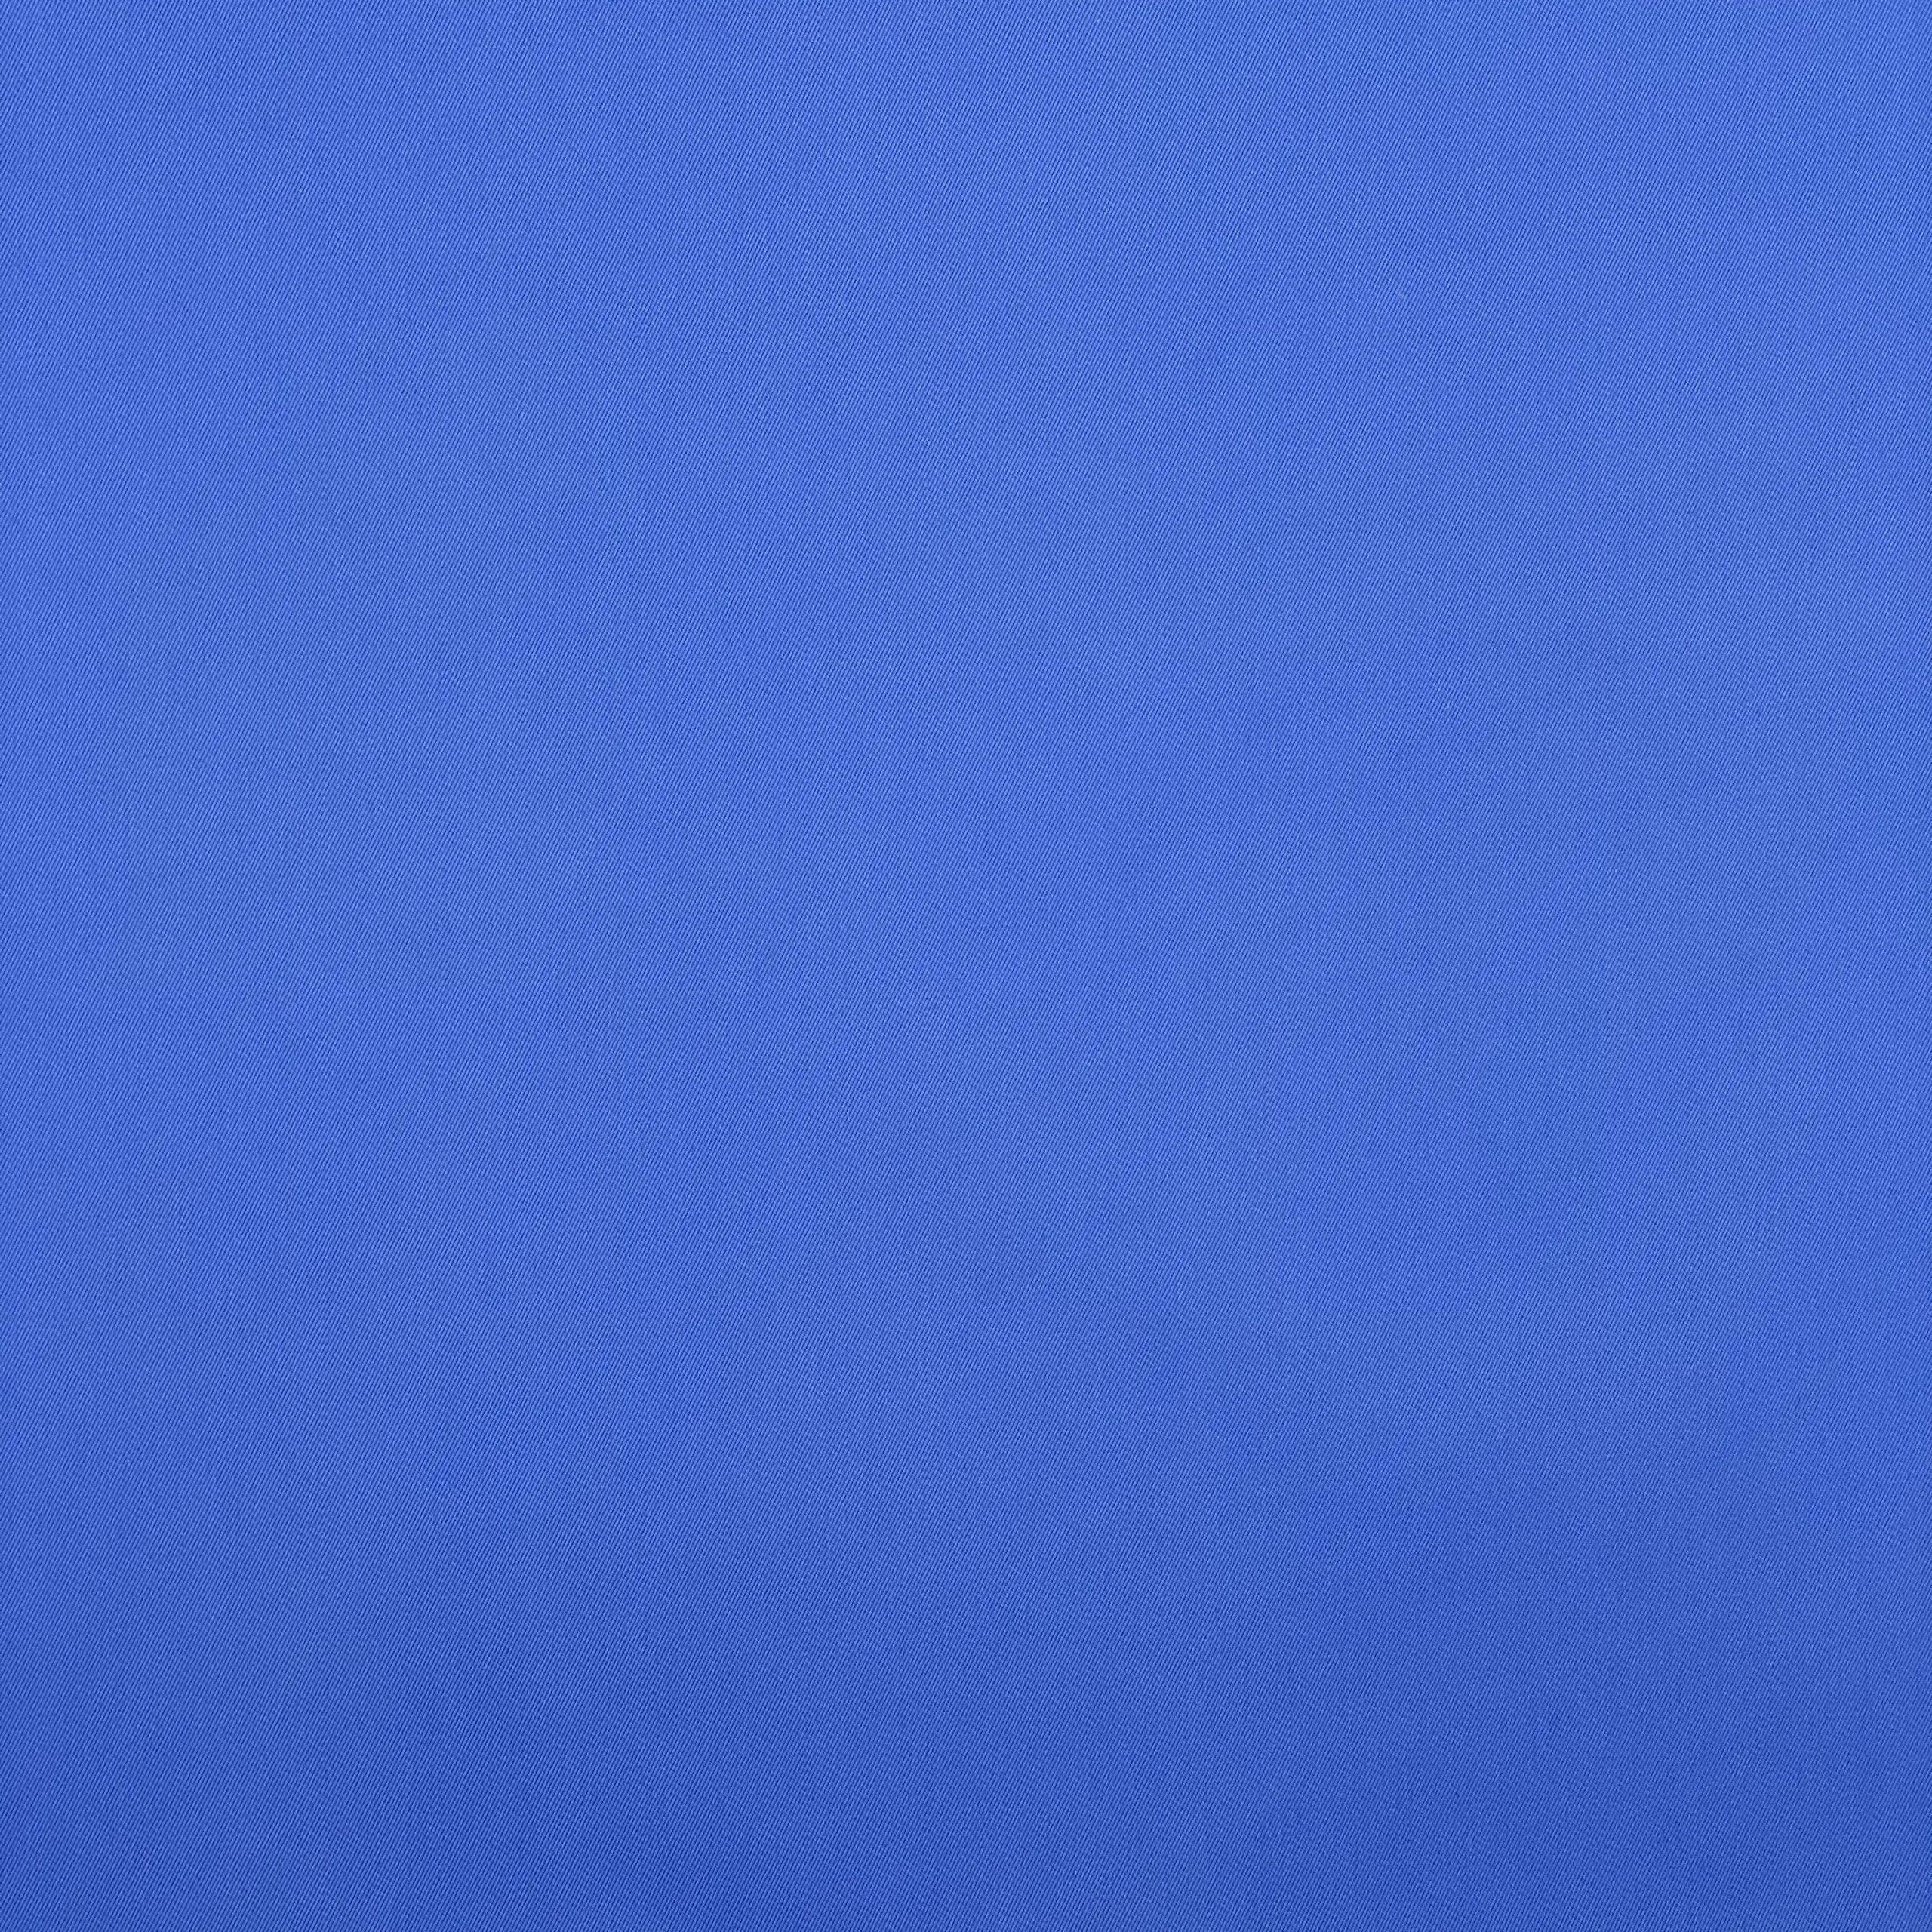 Cotton-Shakespear-Light-Blue-203